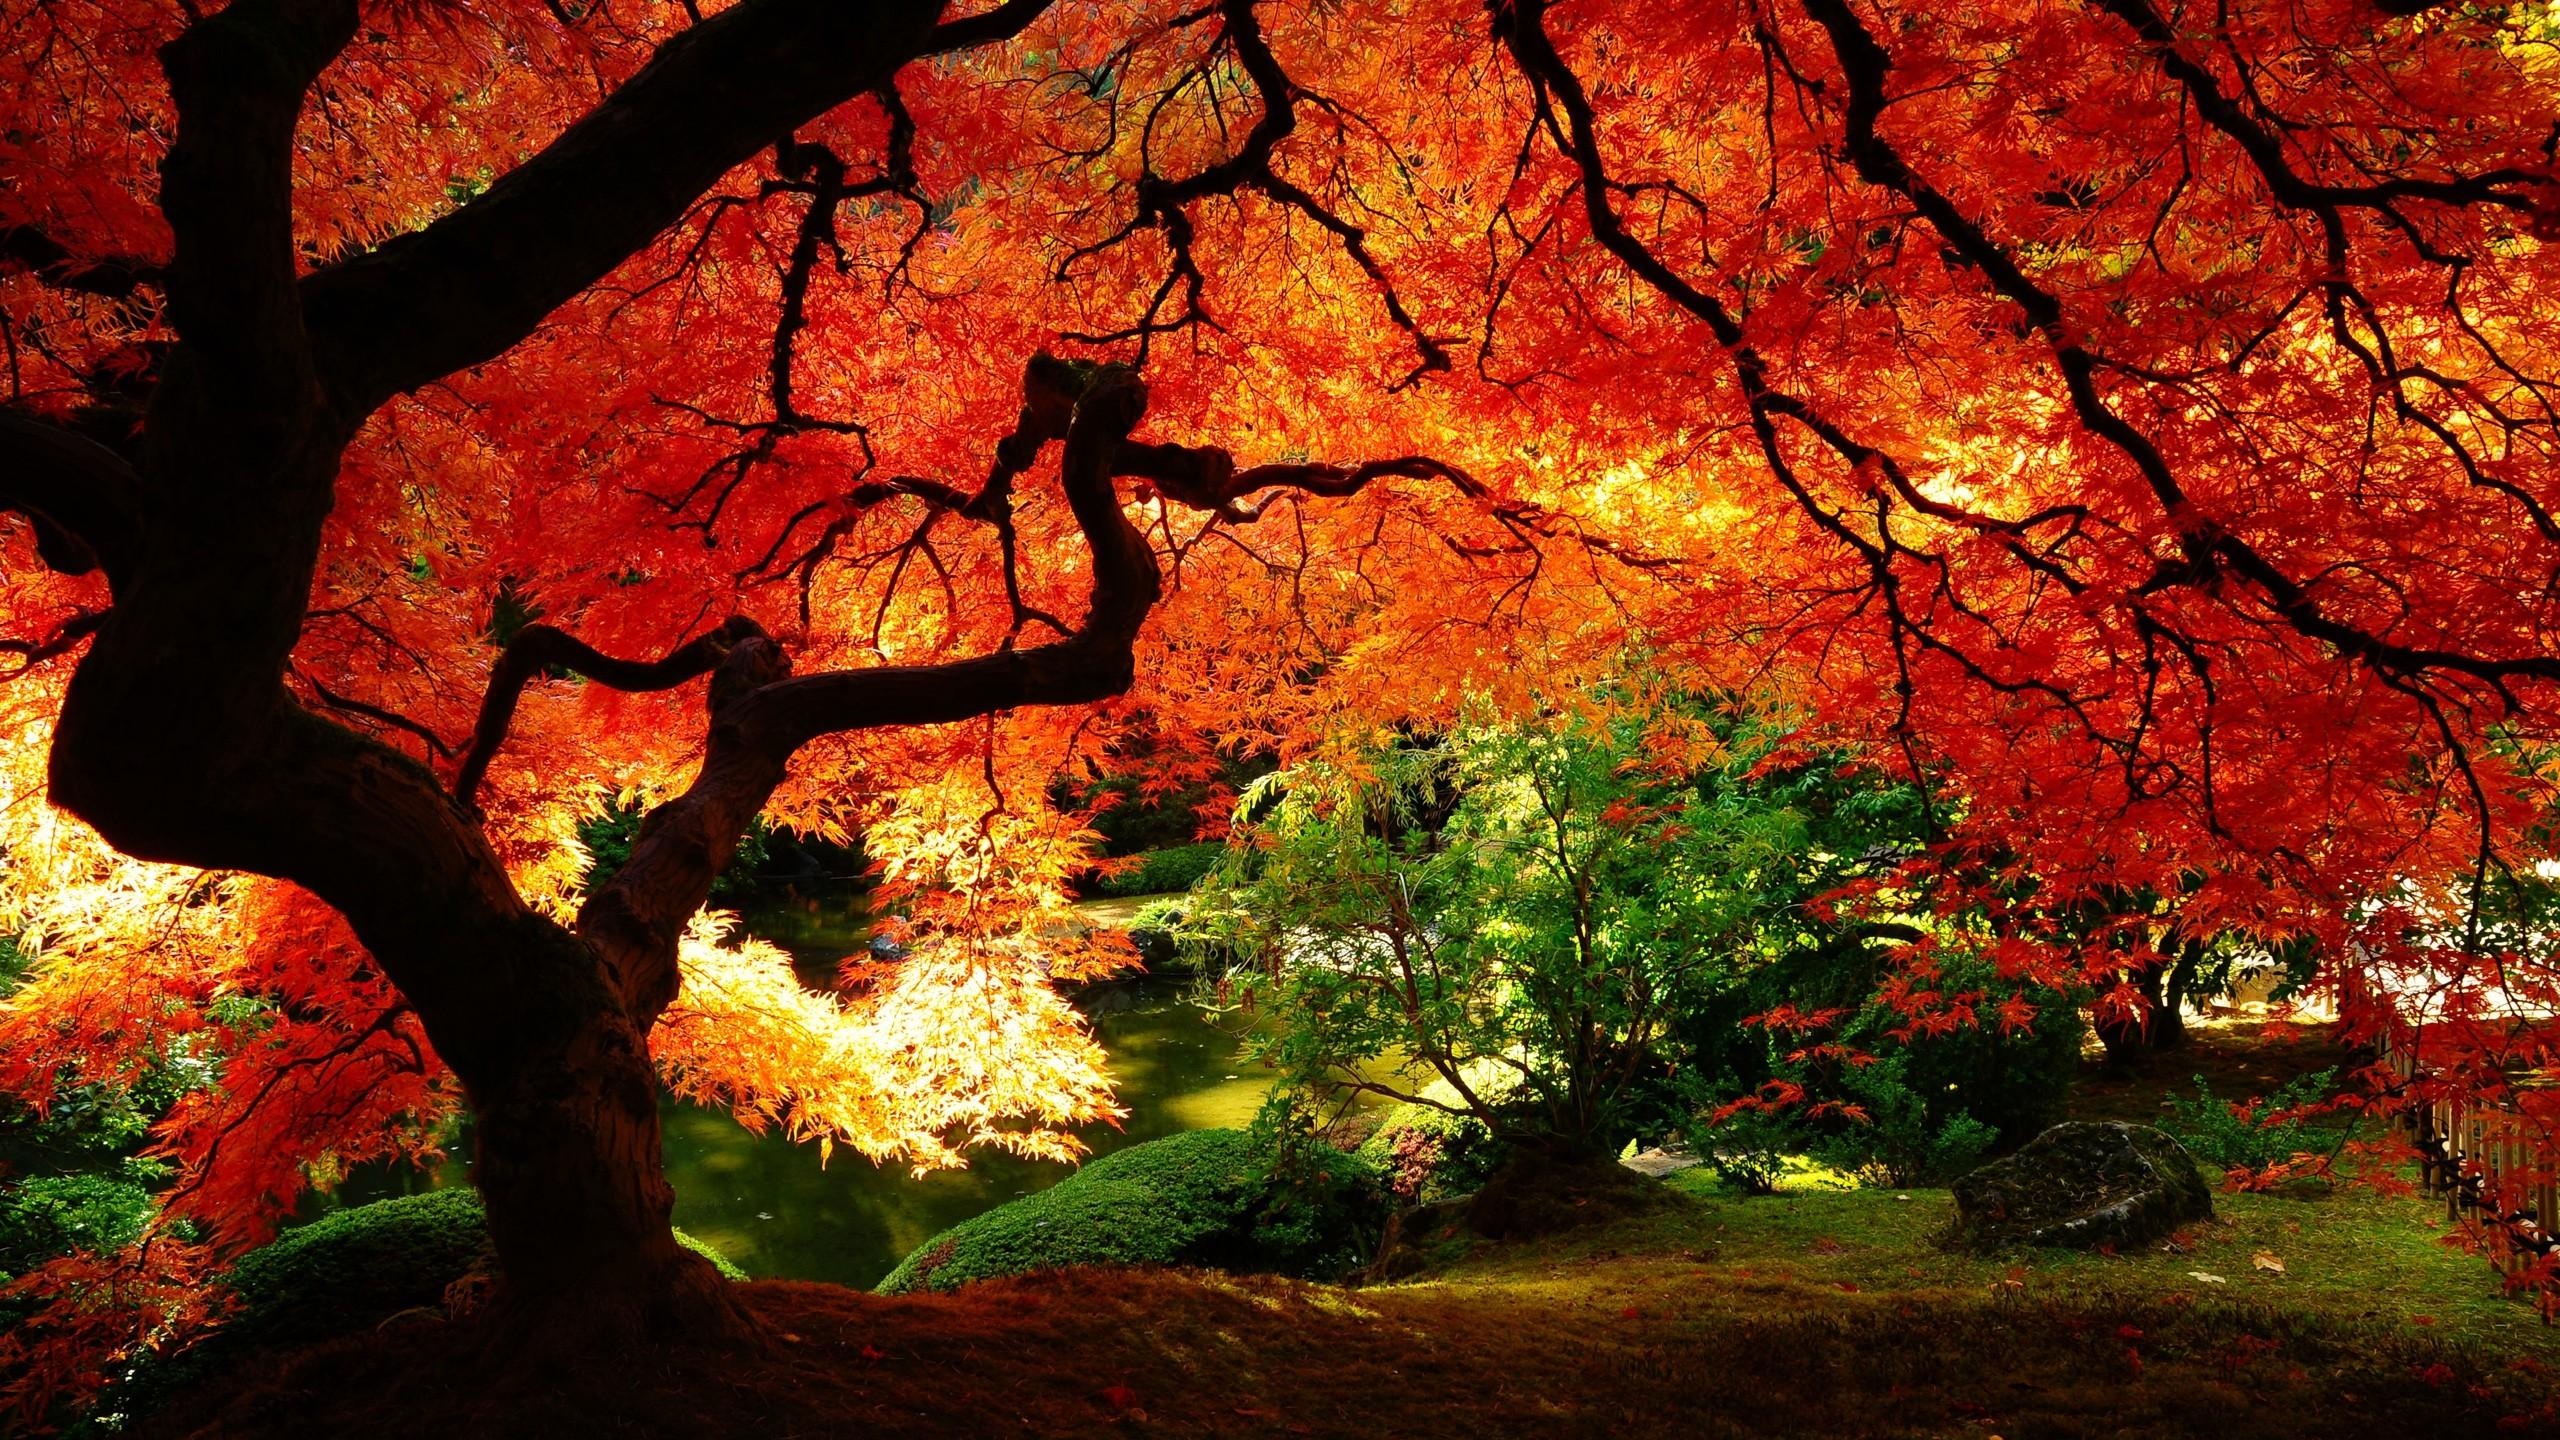 japonais rouge wallpaper hd japanese garden trees autumn 2560x1440 2560x1440